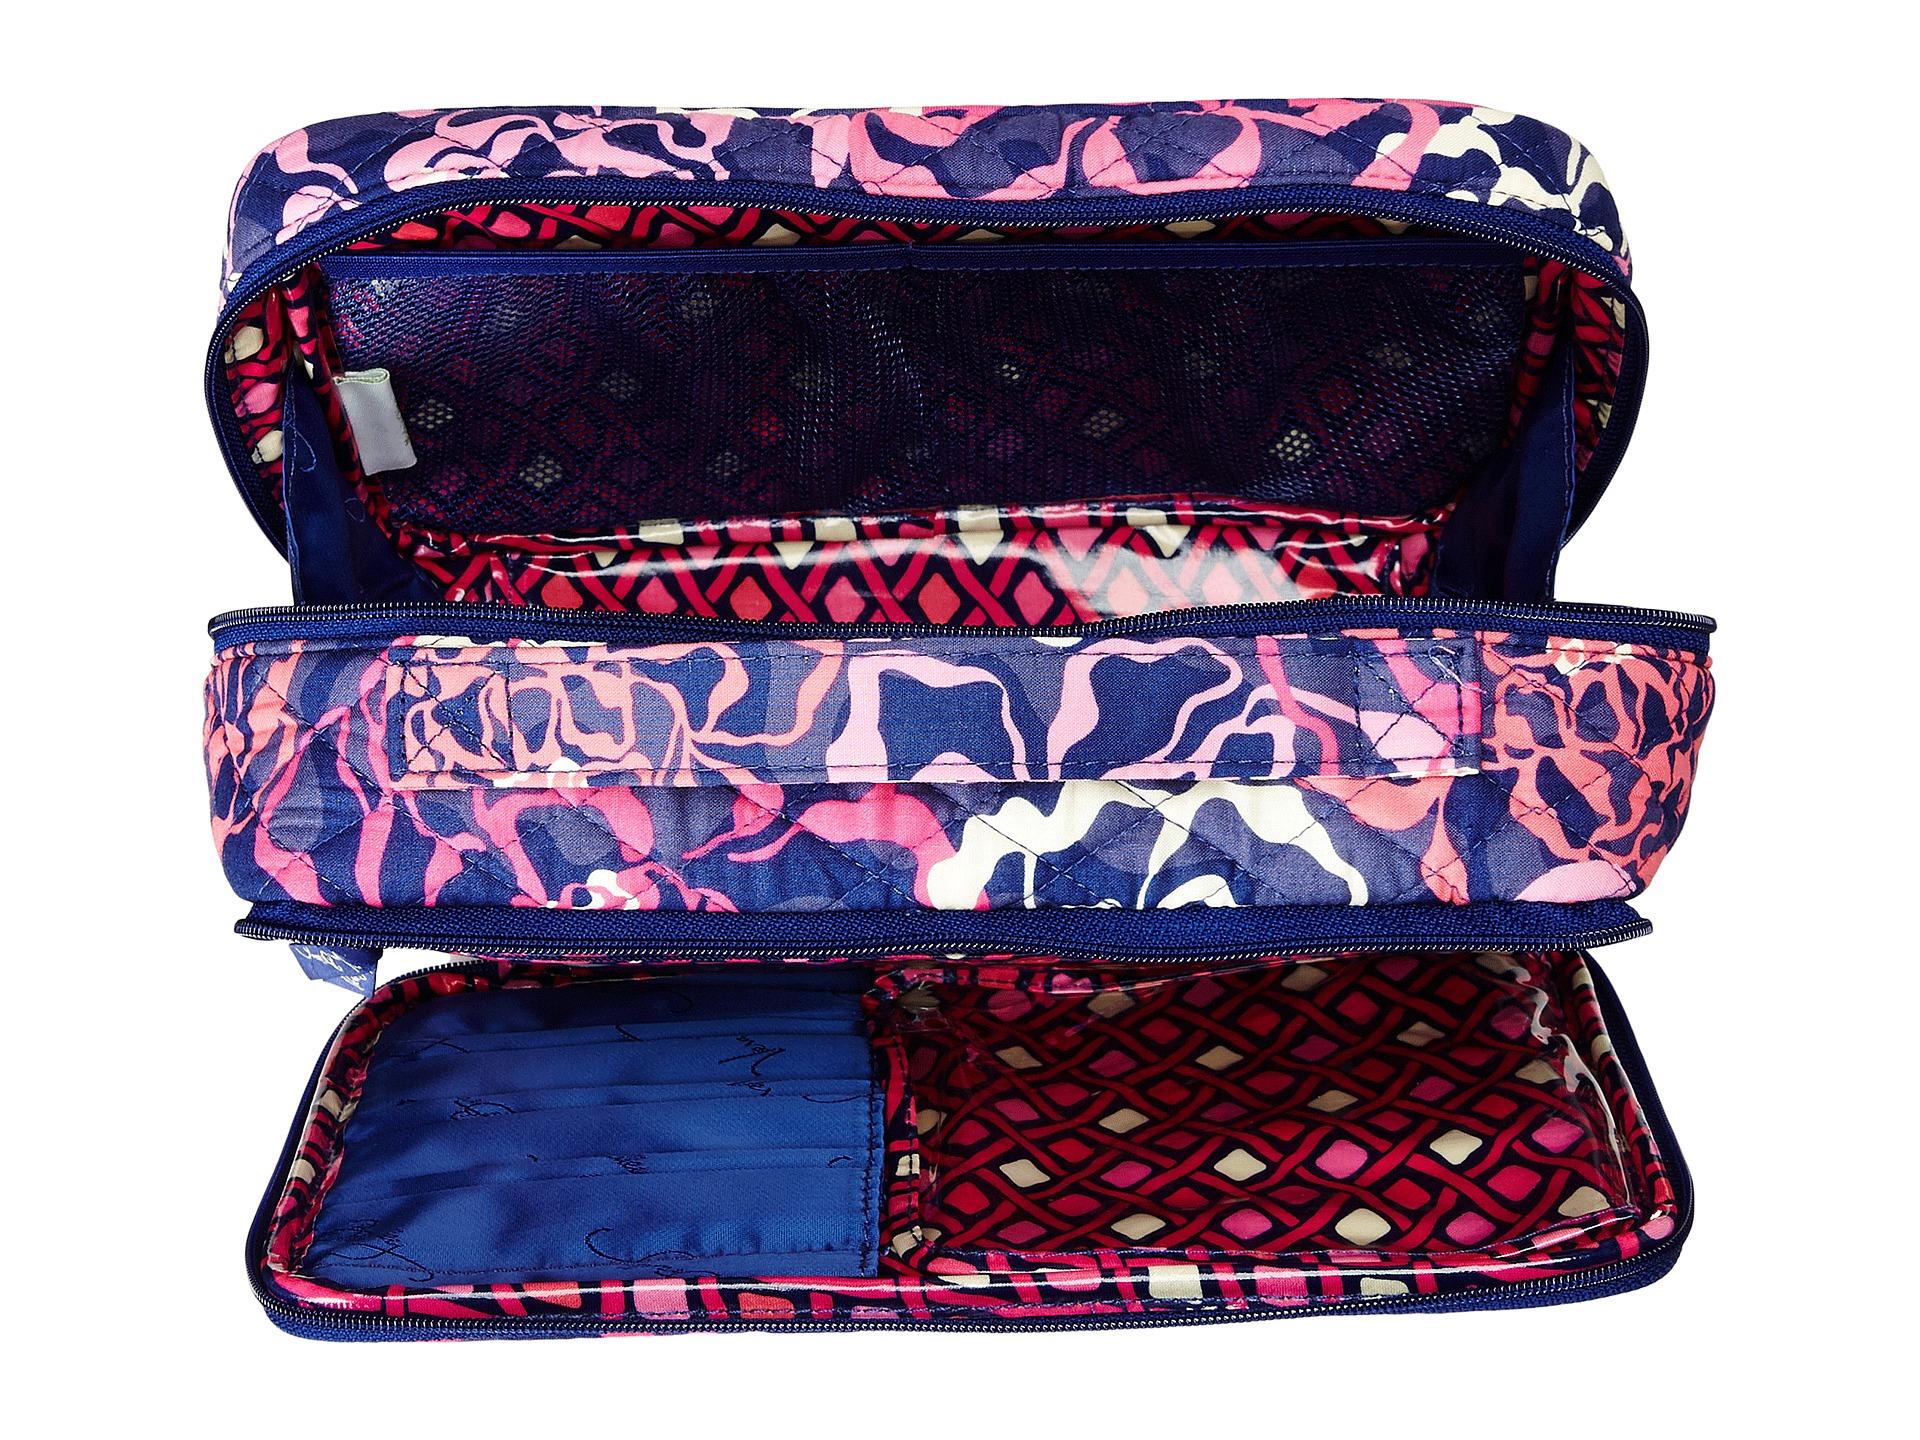 3ae6cc4068dc Lyst - Vera Bradley Large Blush   Brush Makeup Case in Pink